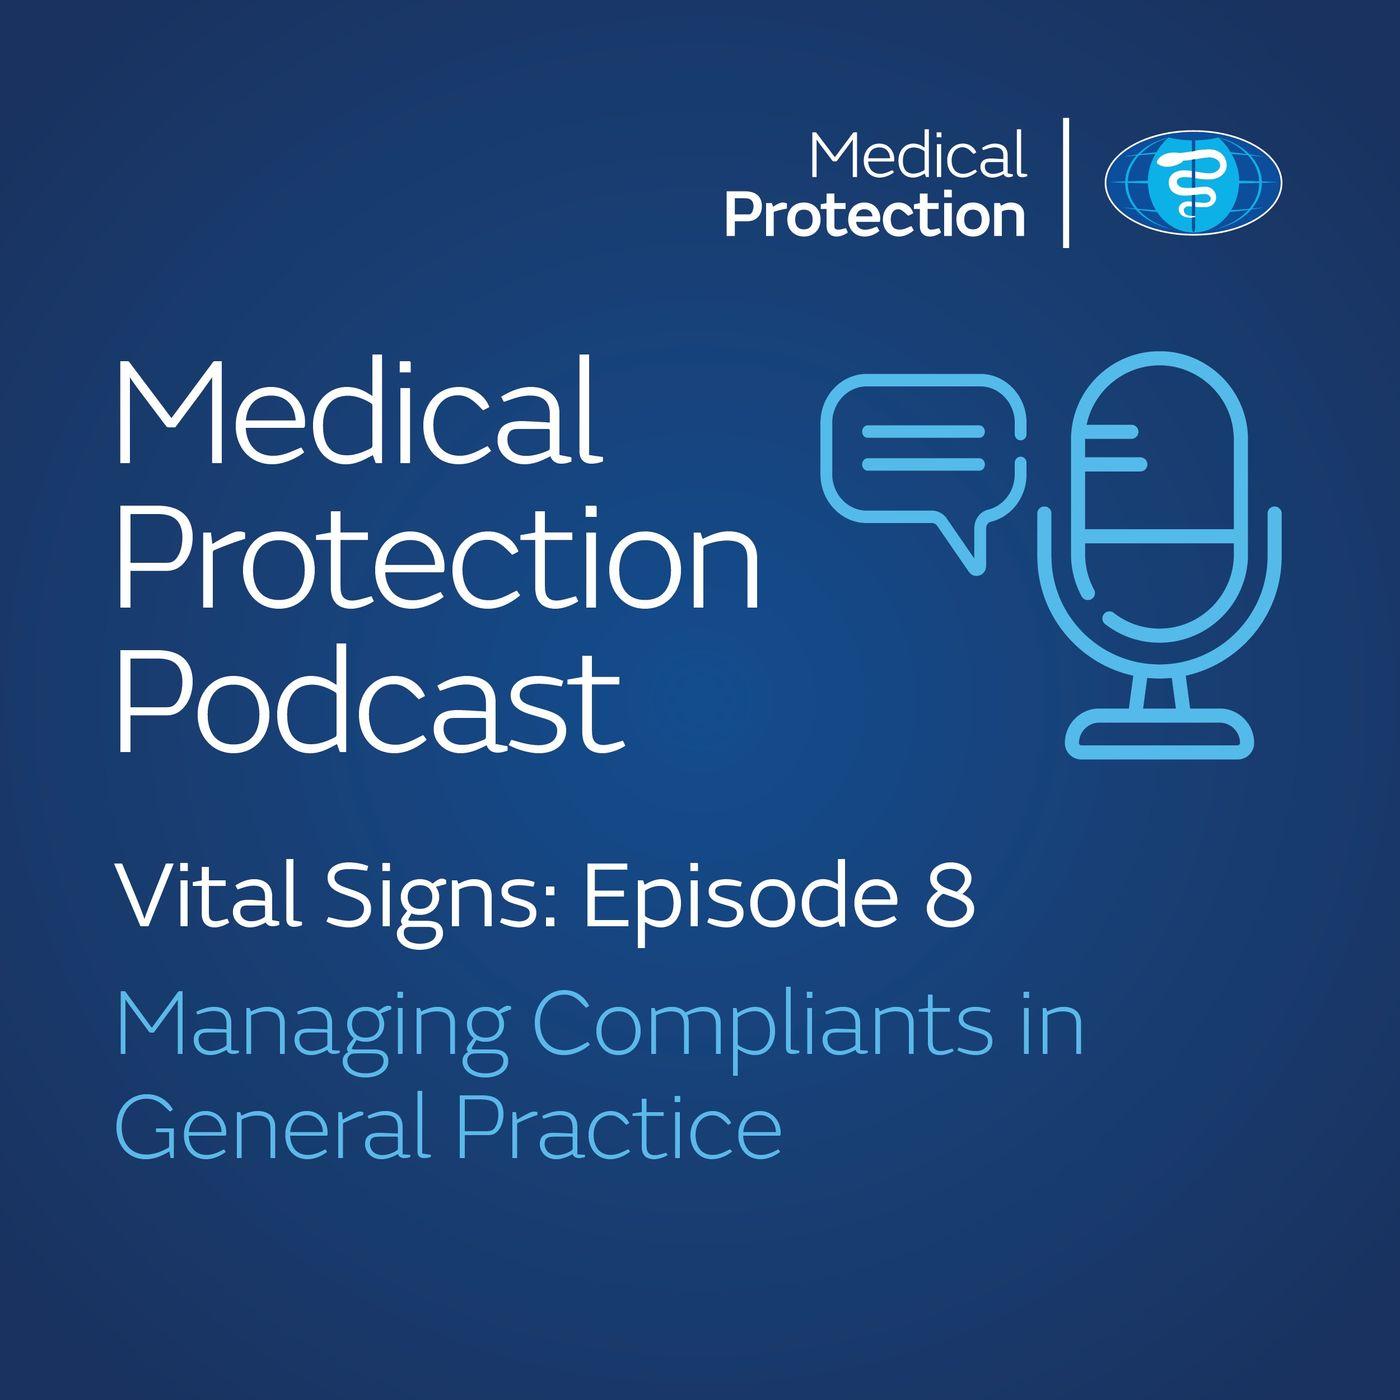 Vital Signs episode 8: Managing Complaints in General Practice